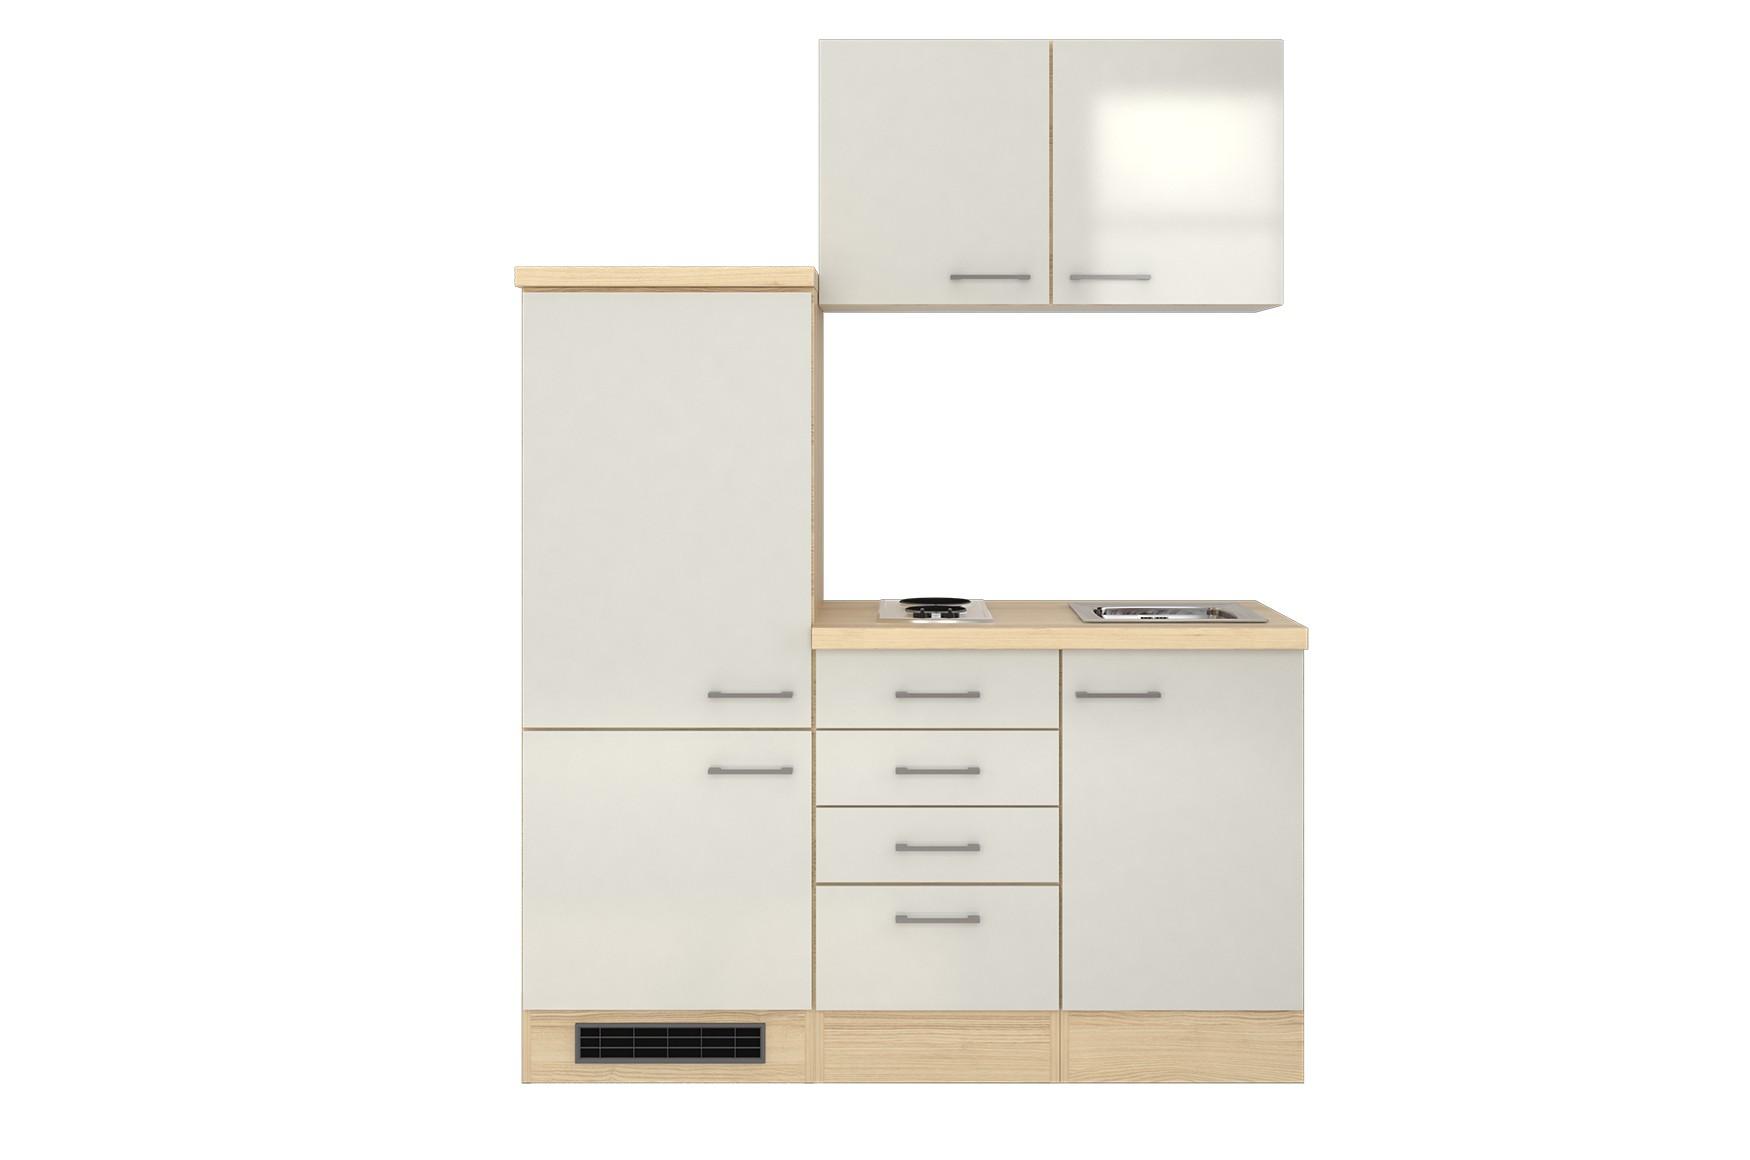 Amica Kühlschrank Ks 15423 : Single kühlschrank mit gefrierfach amica kühlschrank ks w